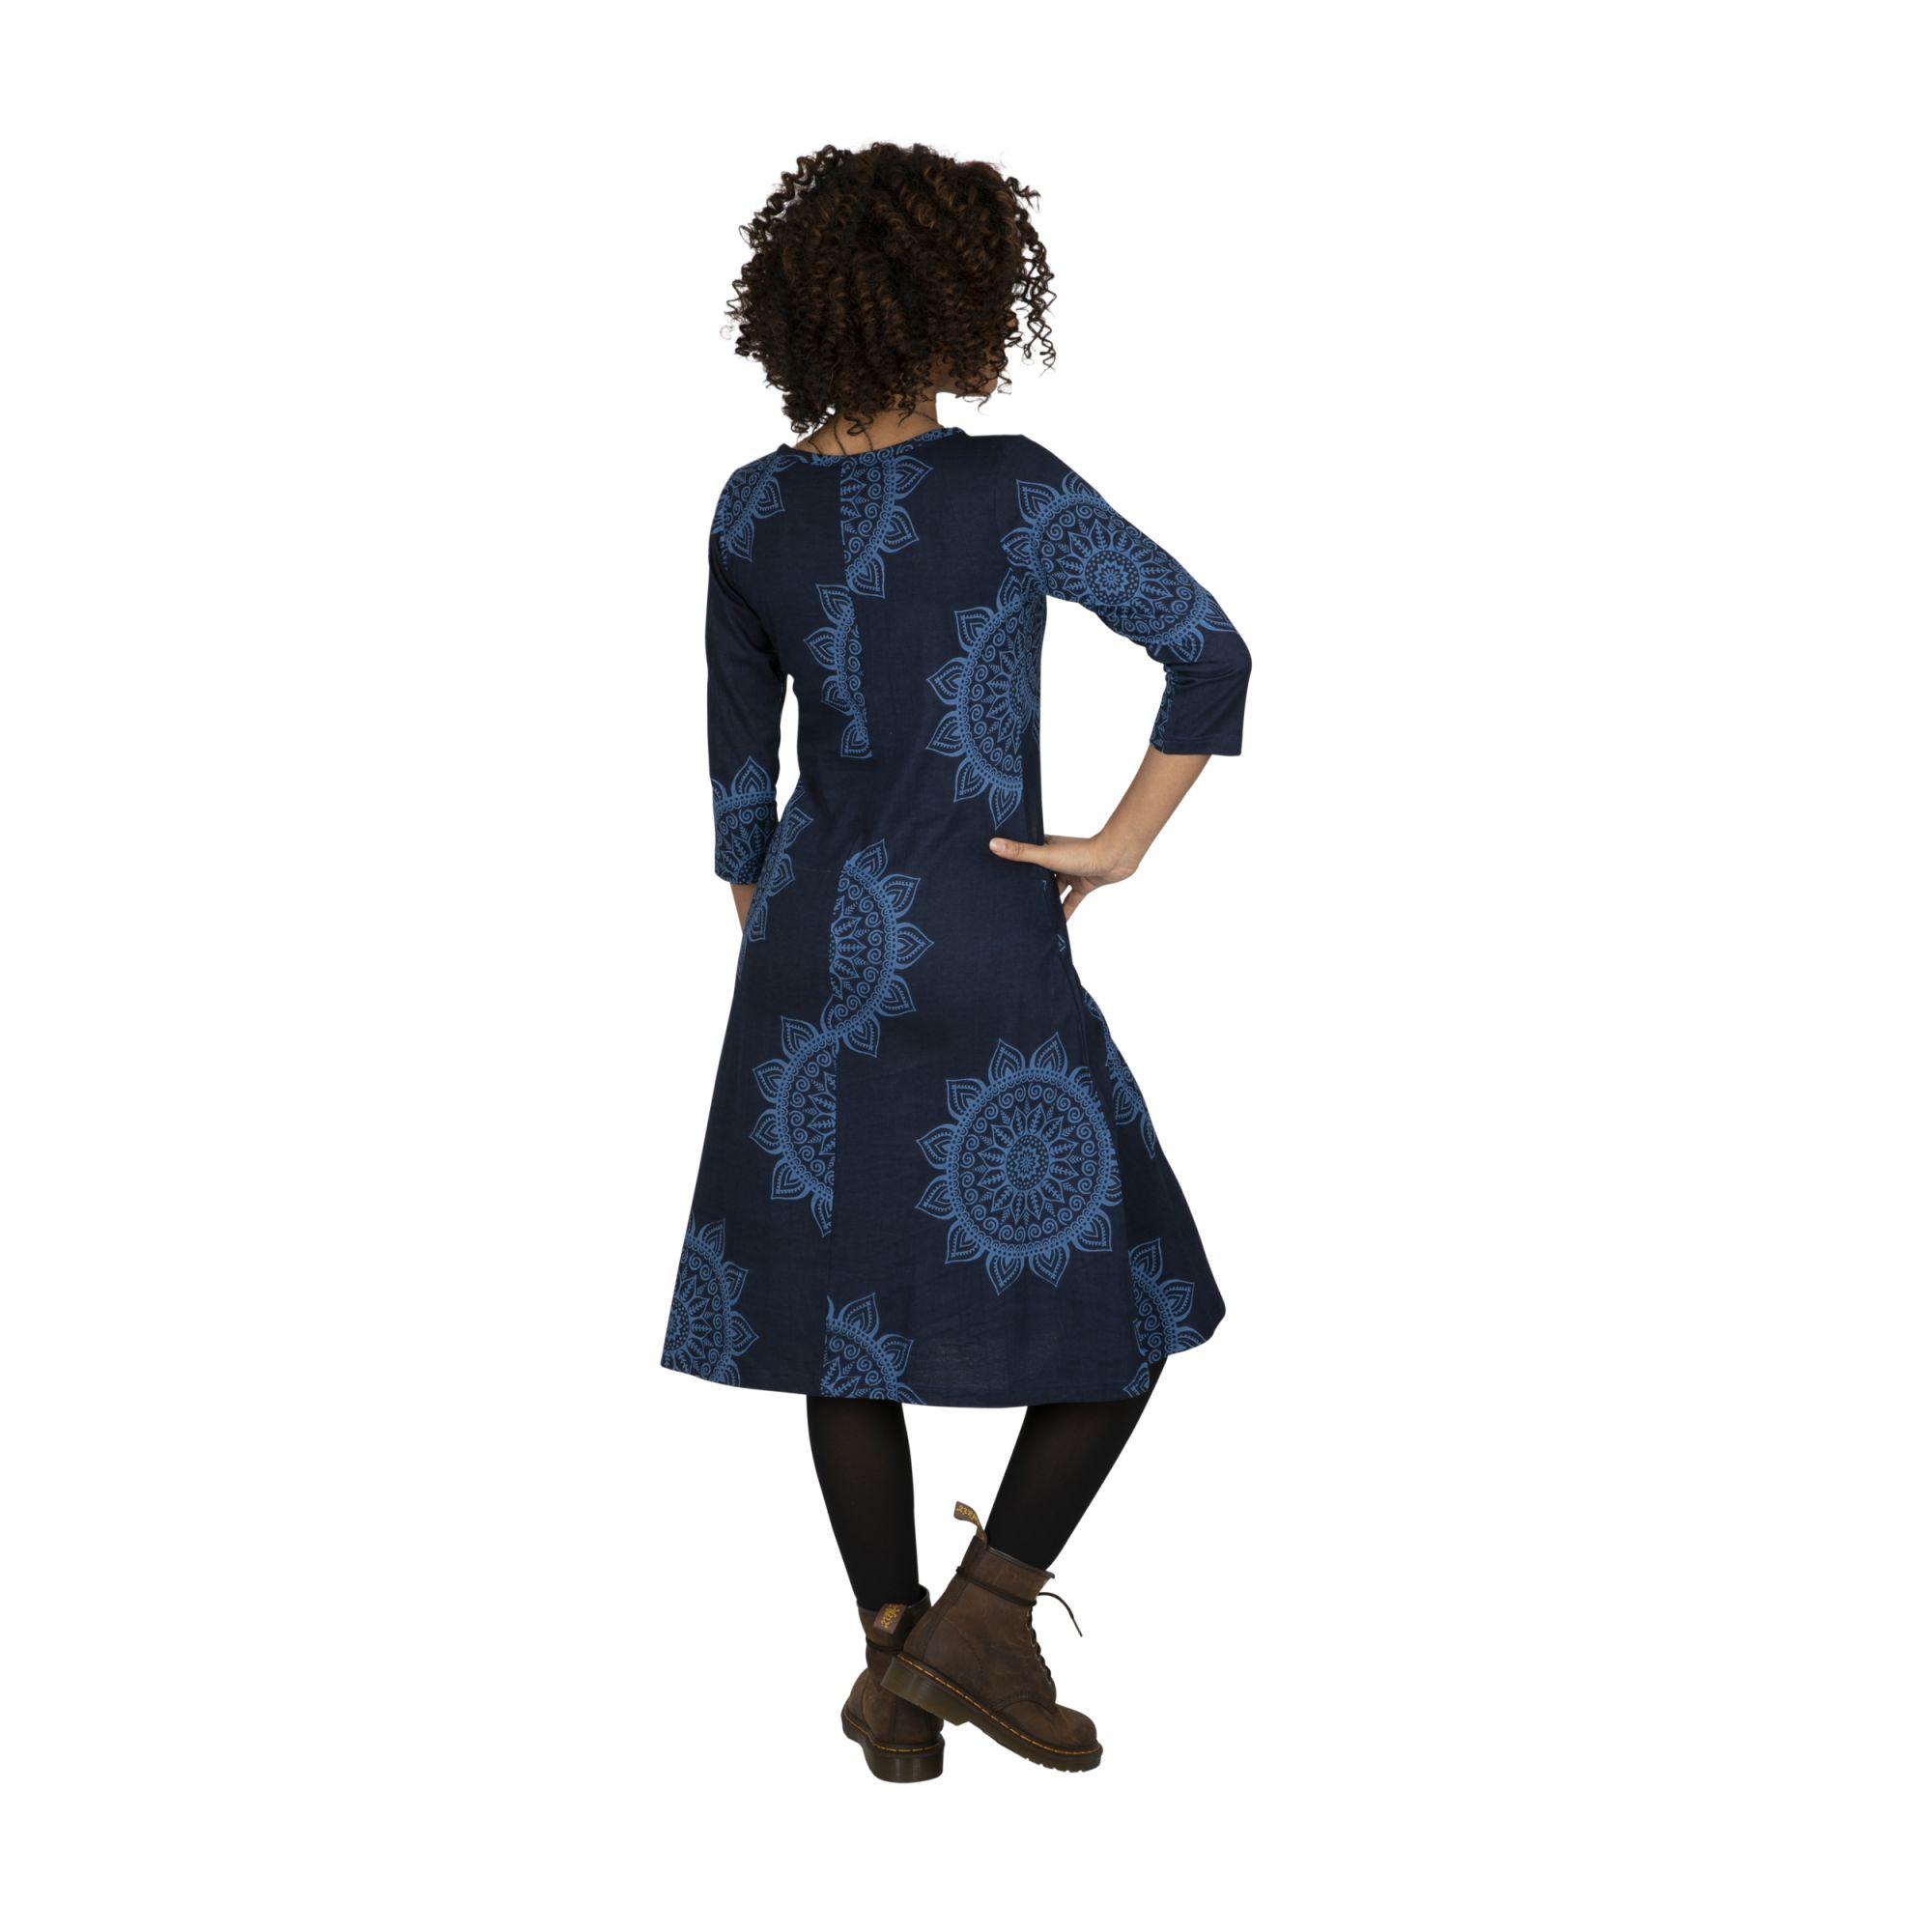 Robe femme bleue bohème à mandalas Gitarama